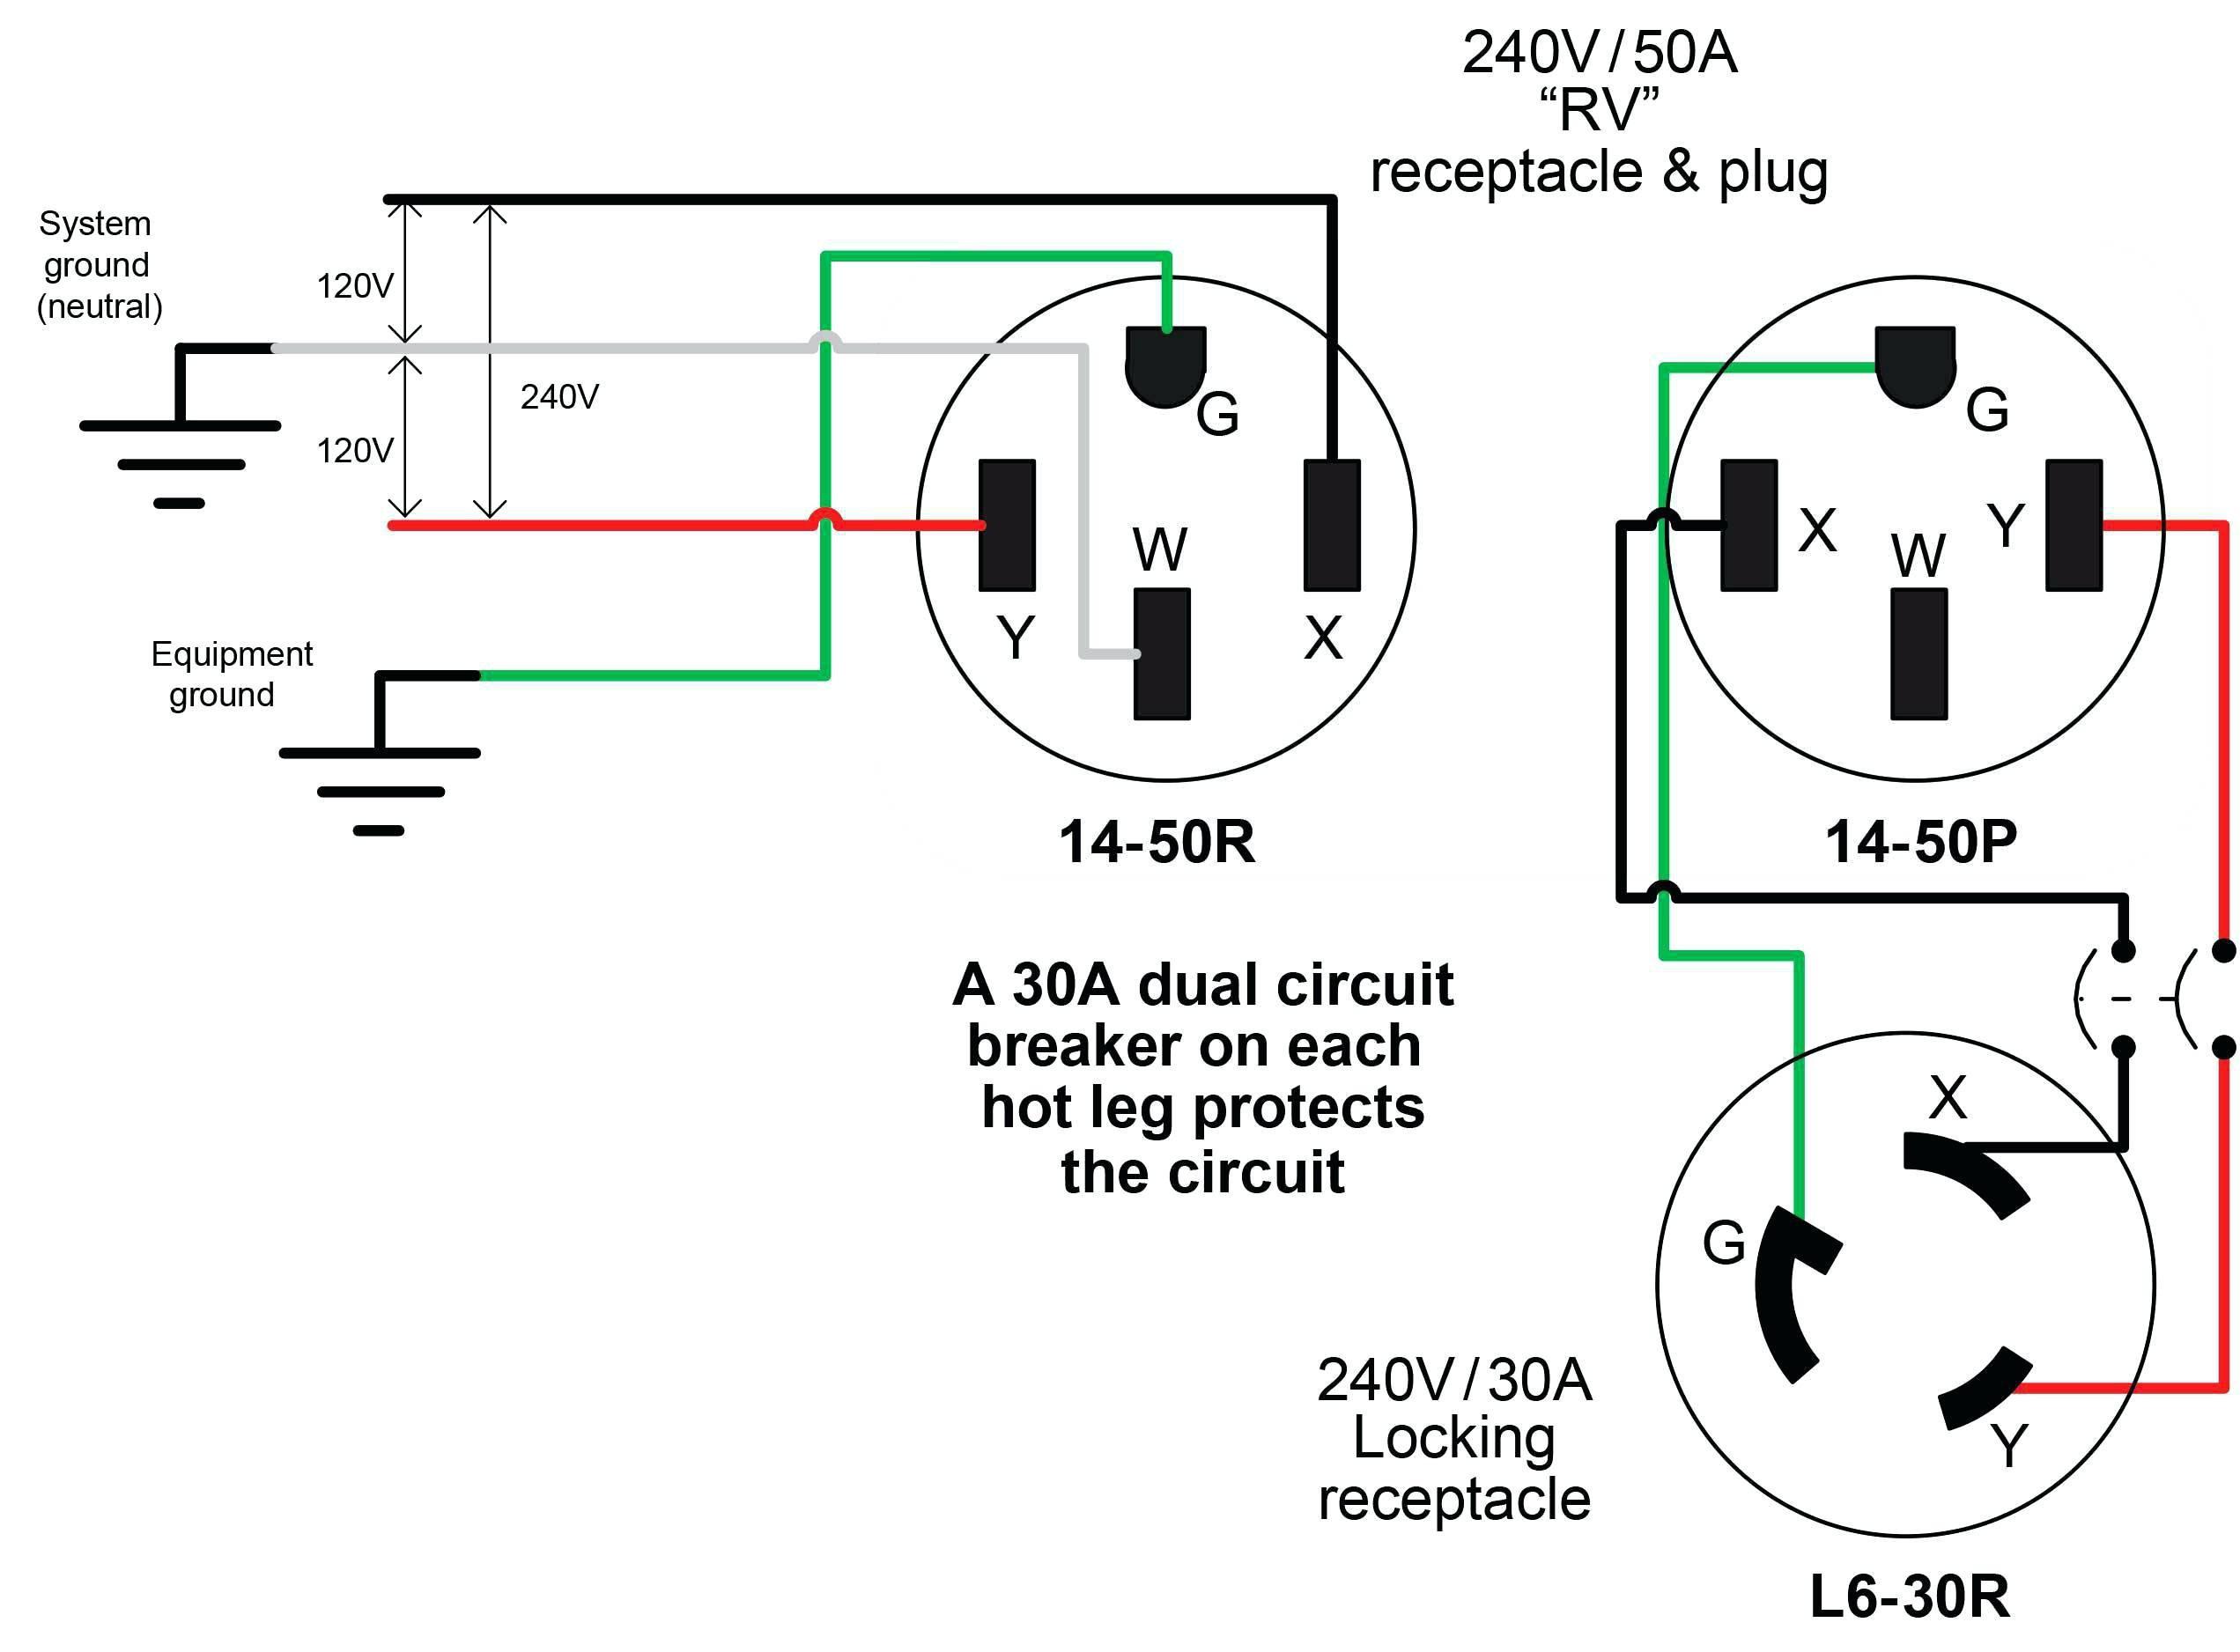 20 Amp Twist Lock Plug Wiring Diagram | Manual E-Books - 50 Amp Twist Lock Plug Wiring Diagram